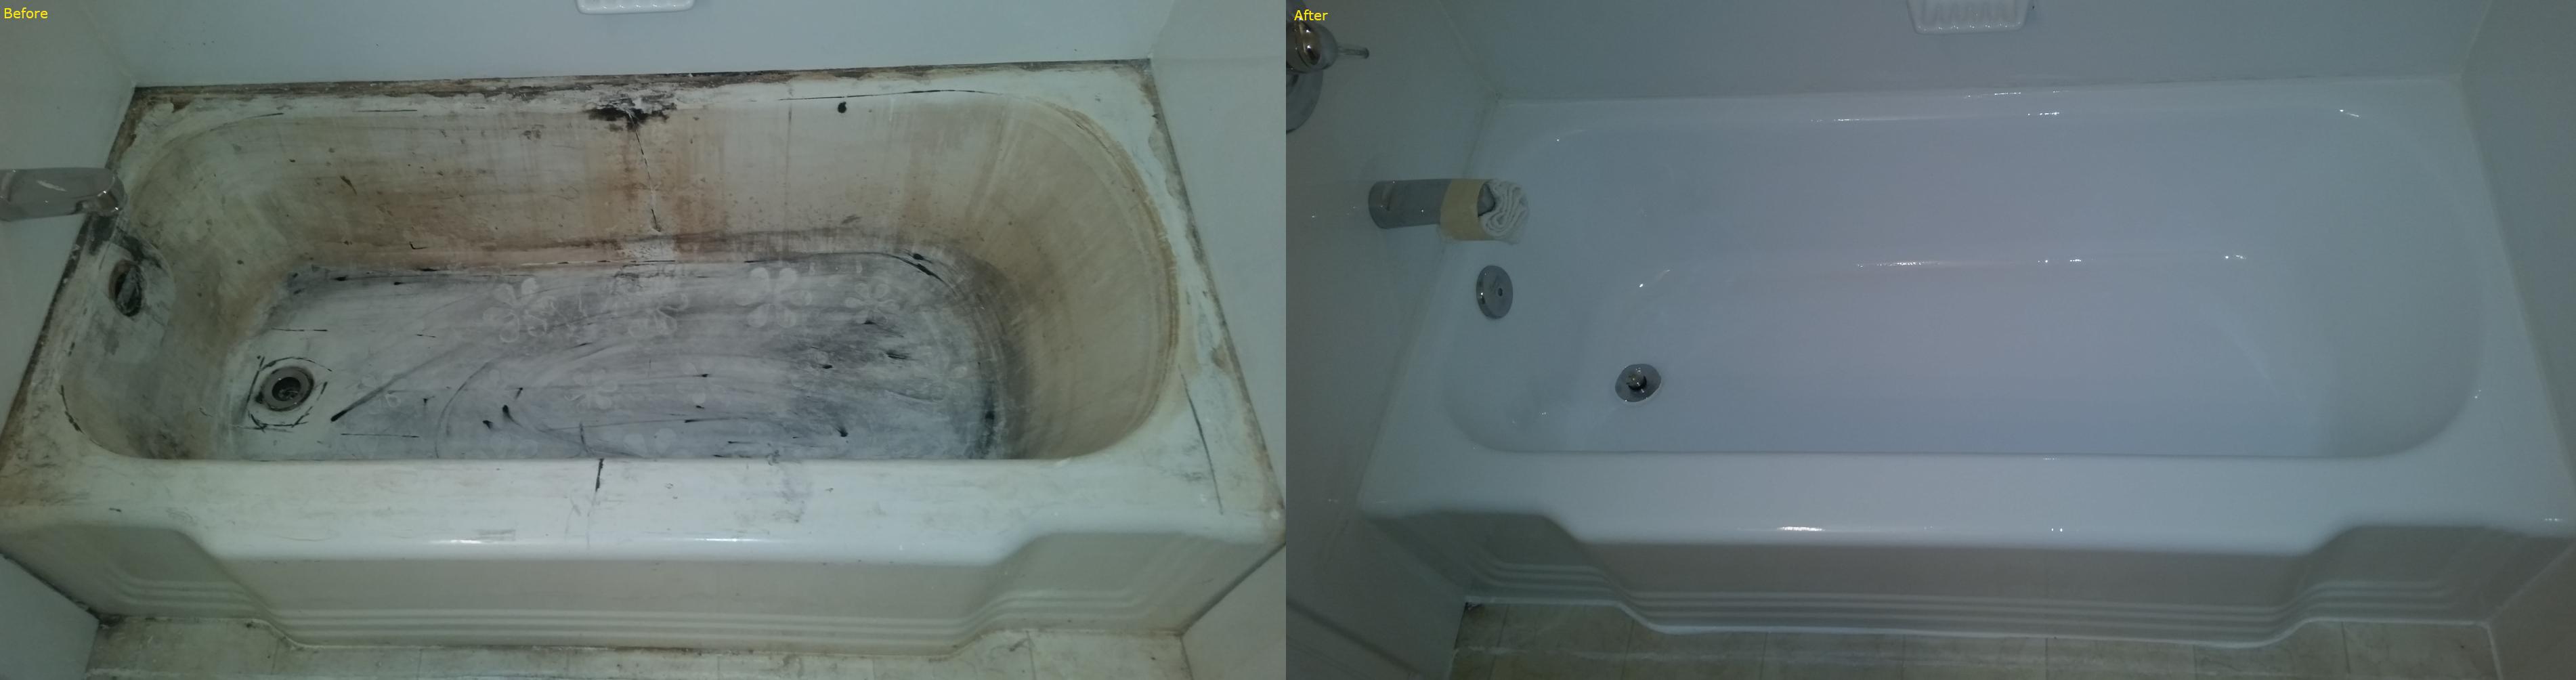 Limted Time Only Deals Best Bathtub Refinish Resurface Re Glaze